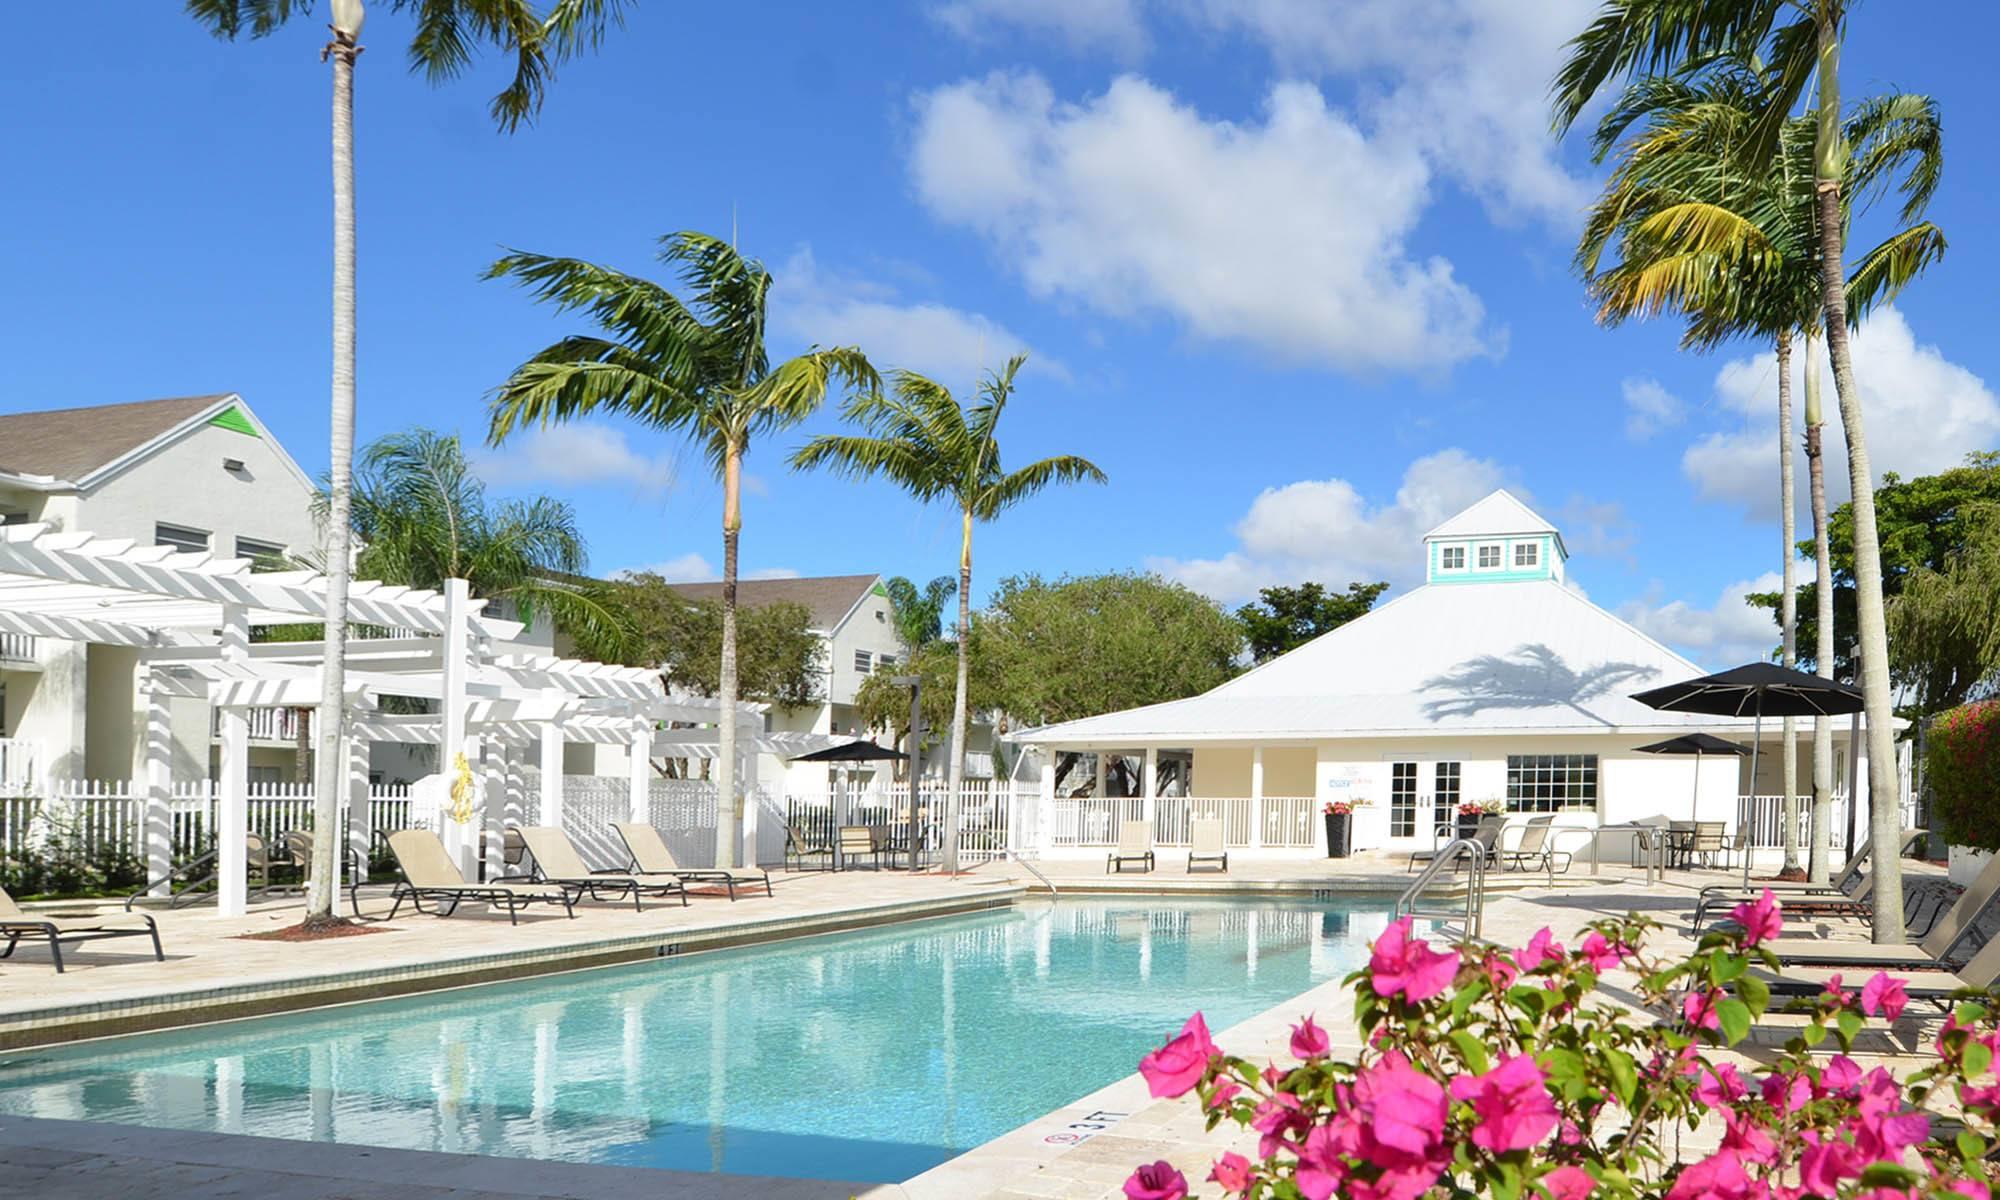 Welcome to Cypress Club Apartments in Tamarac, FL